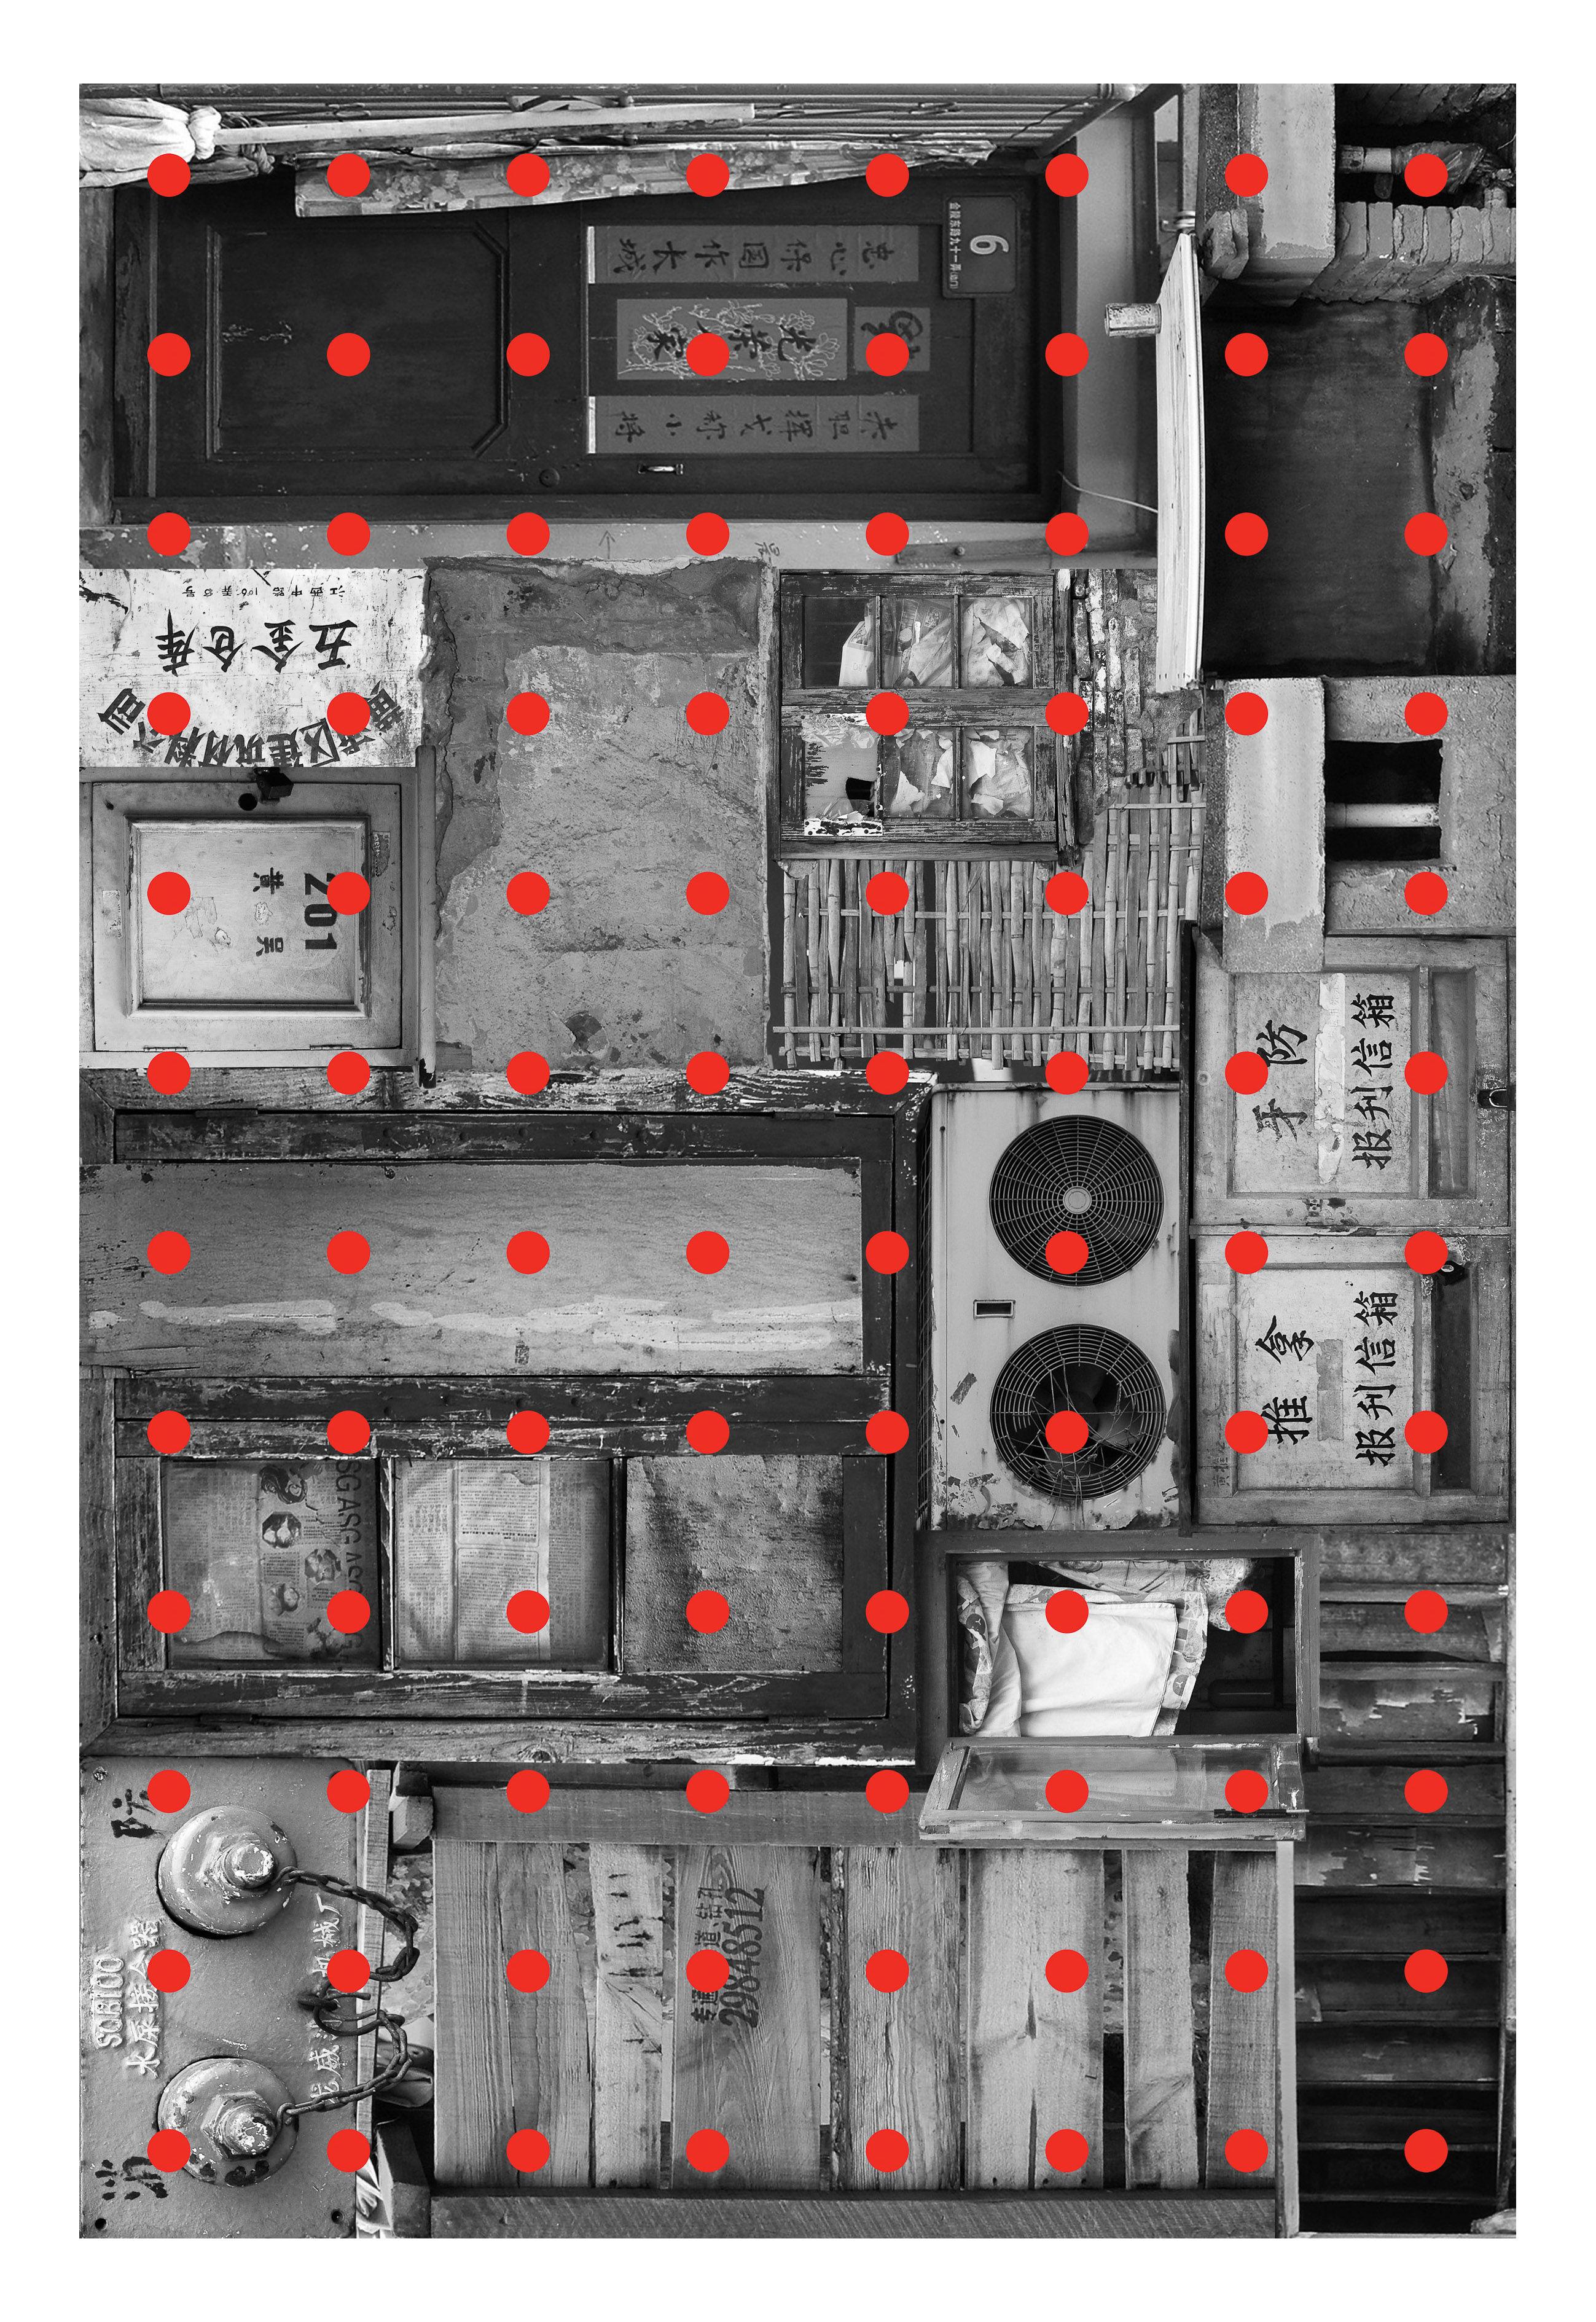 Dekoration - Teppiche - Remnant 1 Teppich / 300 x 200 cm - Moooi Carpets - Rot & grau - Polyamid